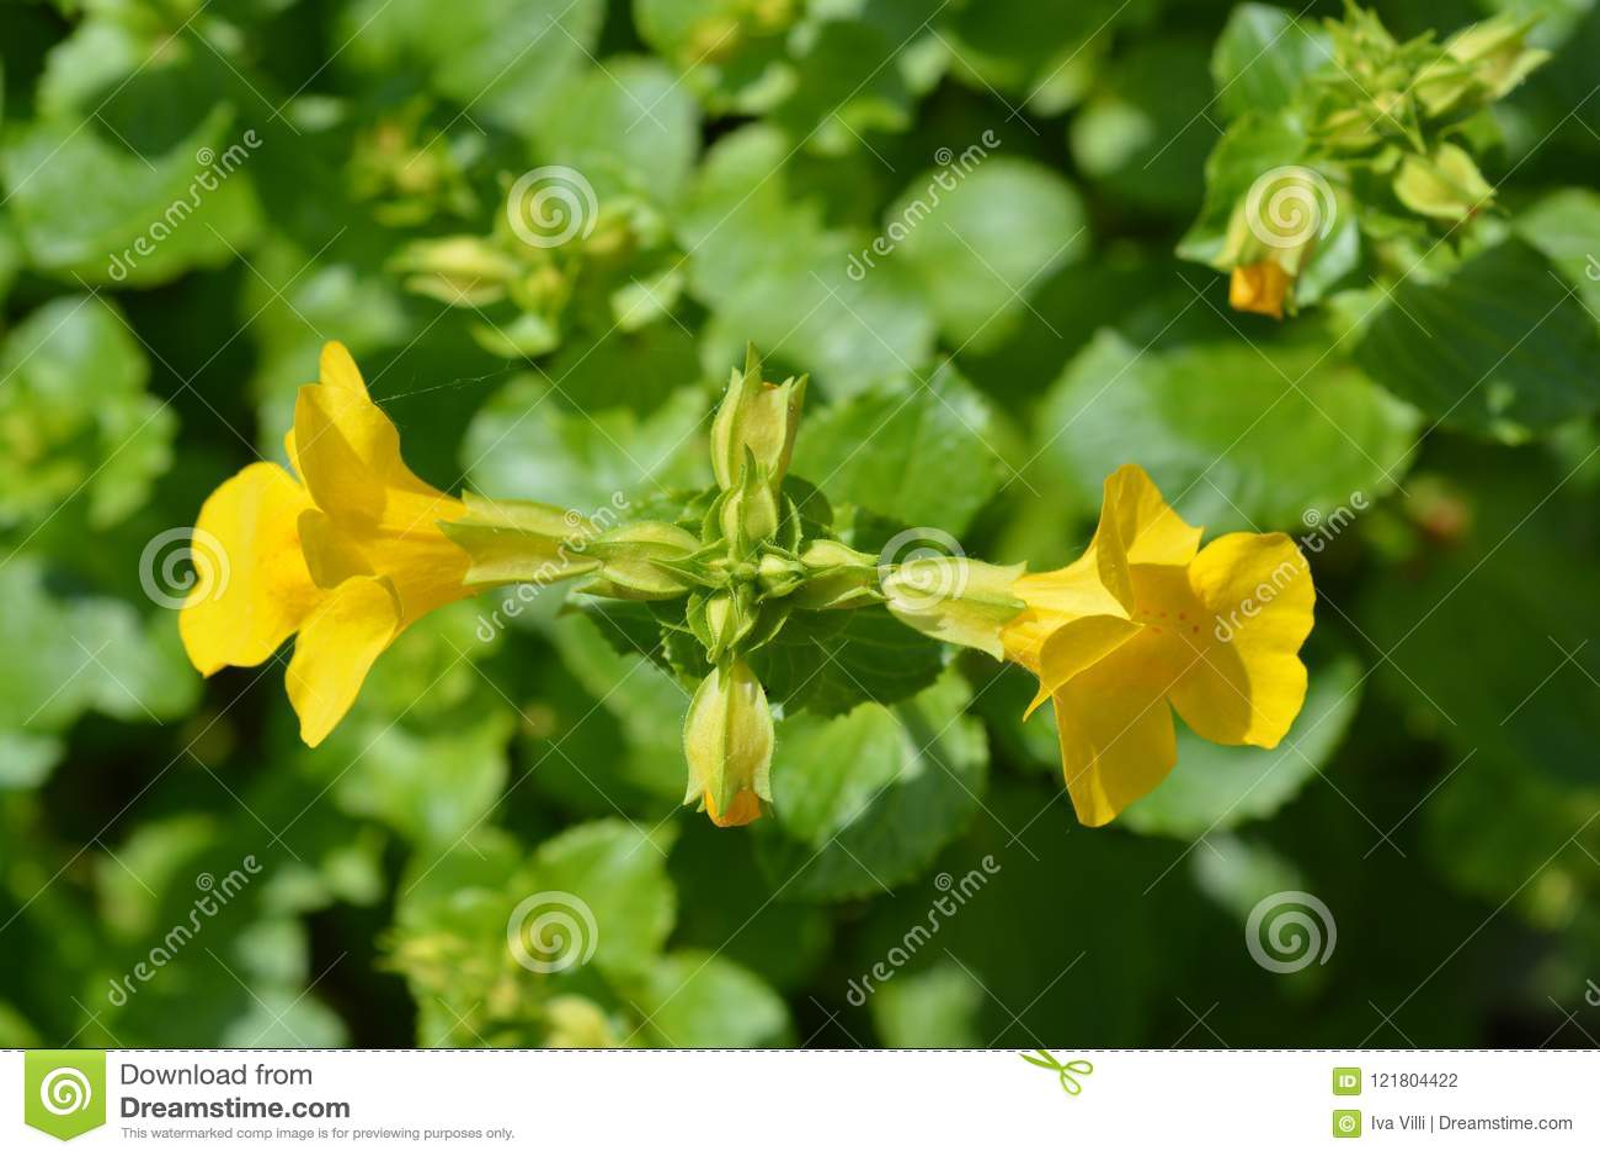 Monkey Flower Stock Photo Image Of Close Macro Musk 121804422